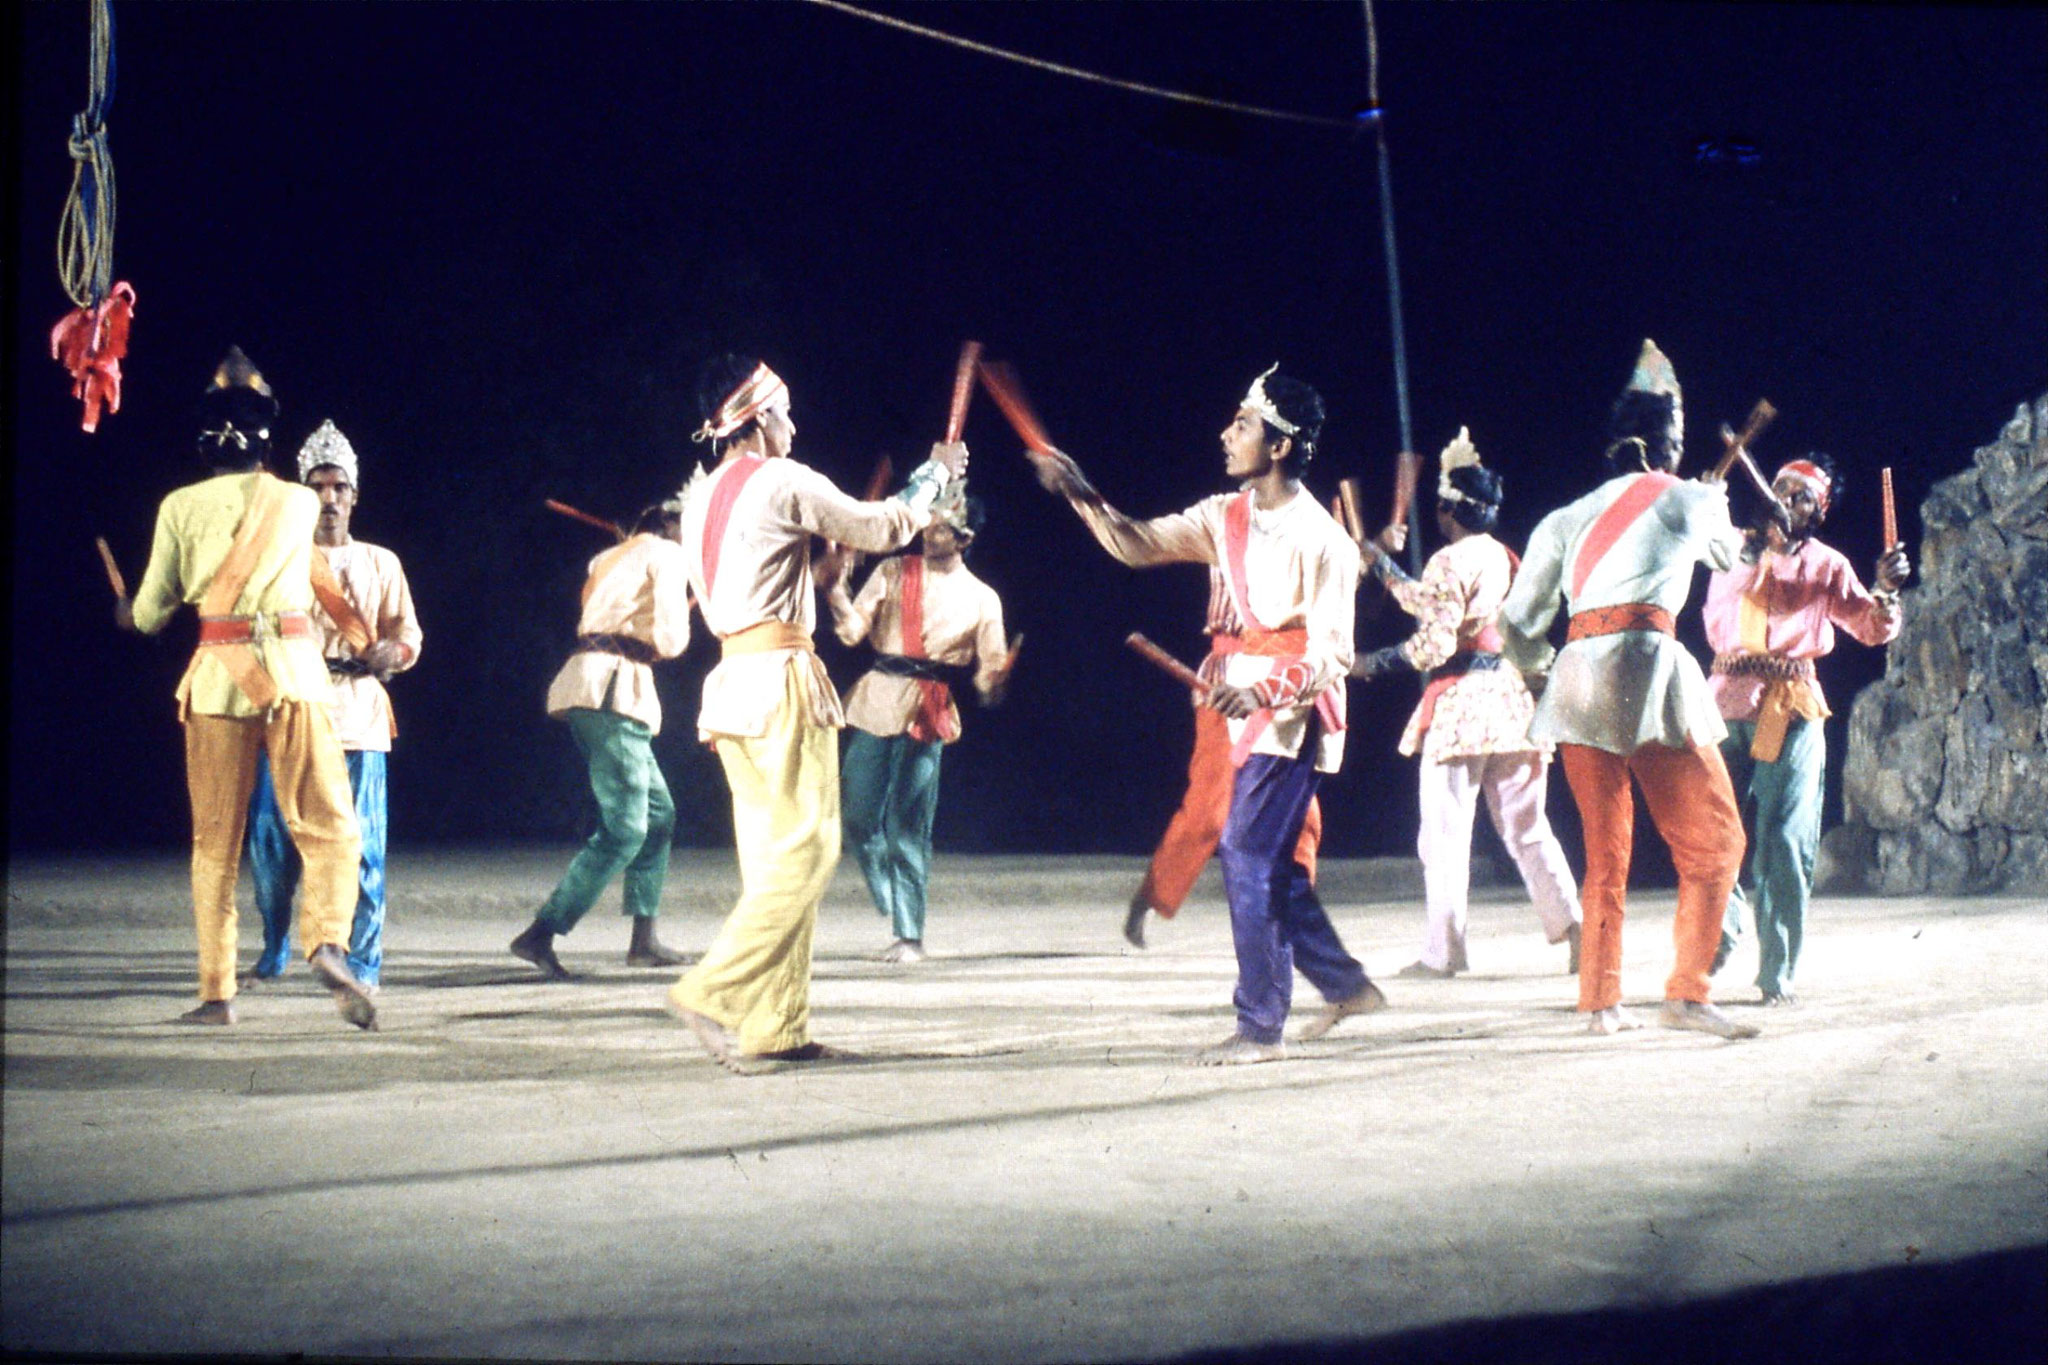 8/12/1989: 30: Udaipur Shilp Gram Craft Centre dancing